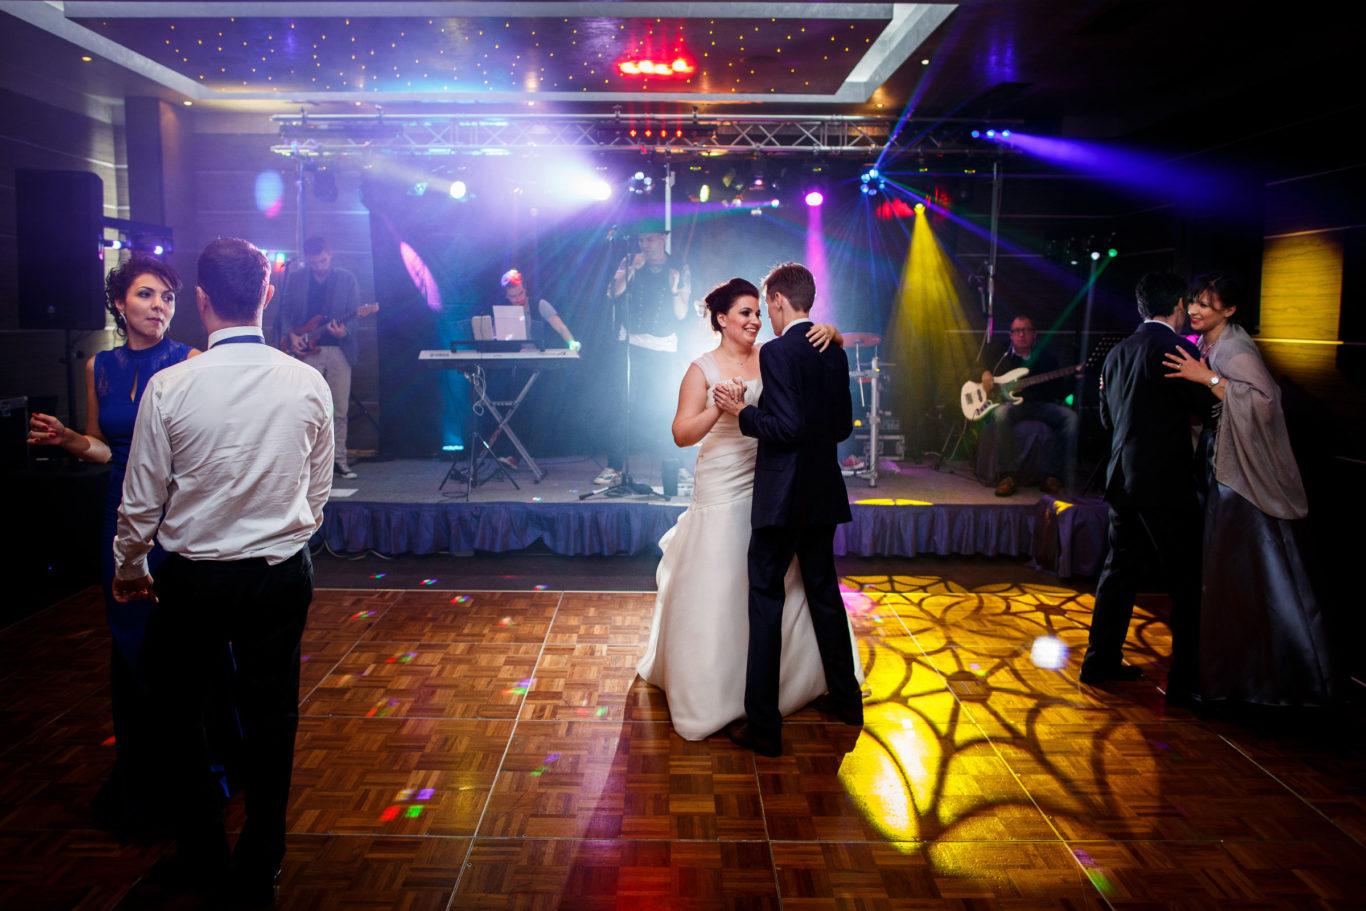 0469-Fotografie-nunta-Roxana-Costin-fotograf-Ciprian-Dumitrescu-DCF_6293